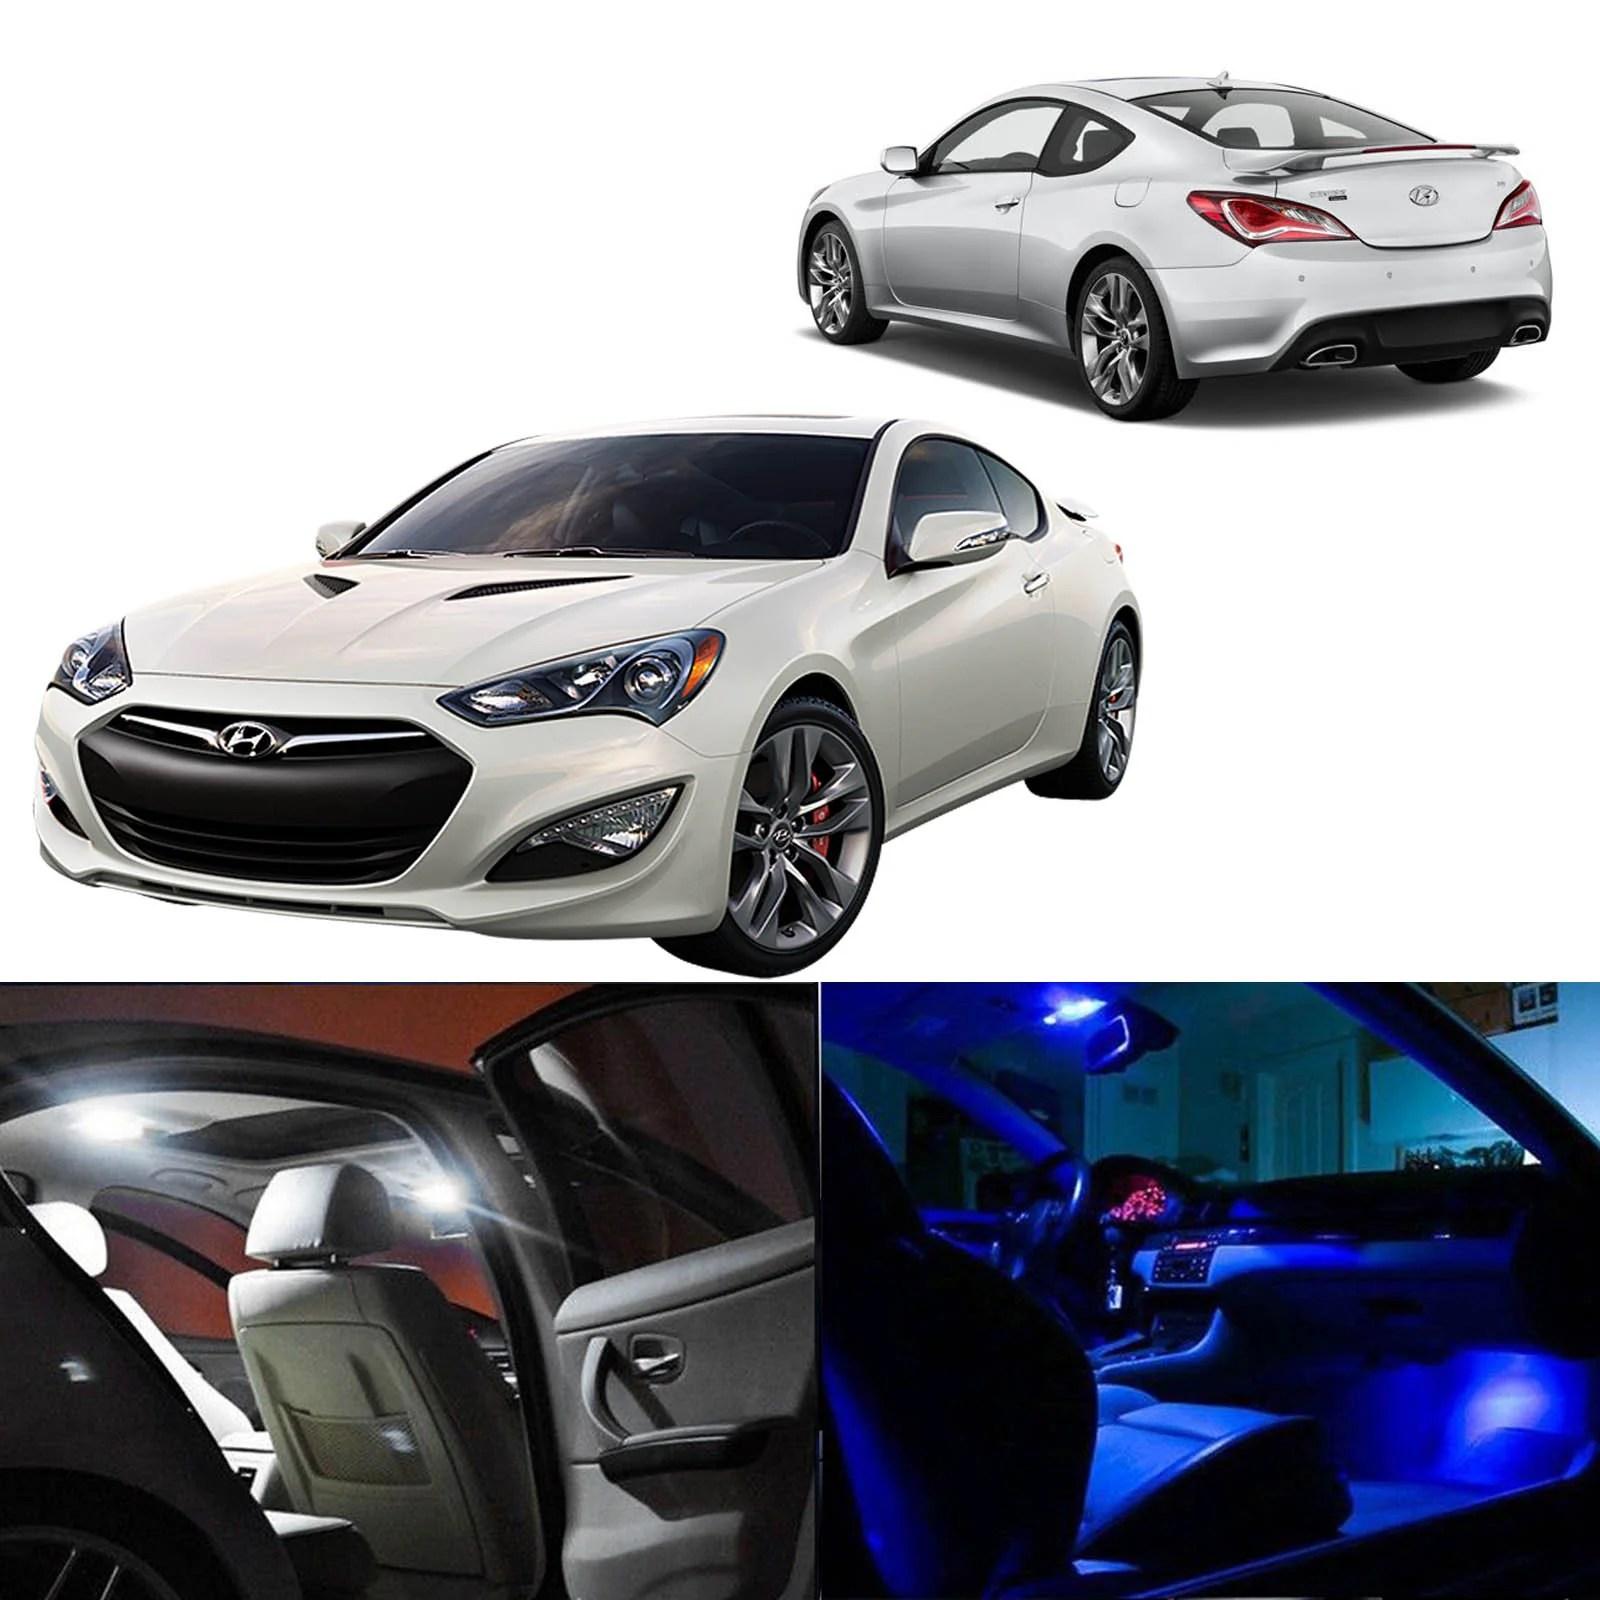 medium resolution of 2010 2015 hyundai genesis coupe 6x interior led lights package kit white blue